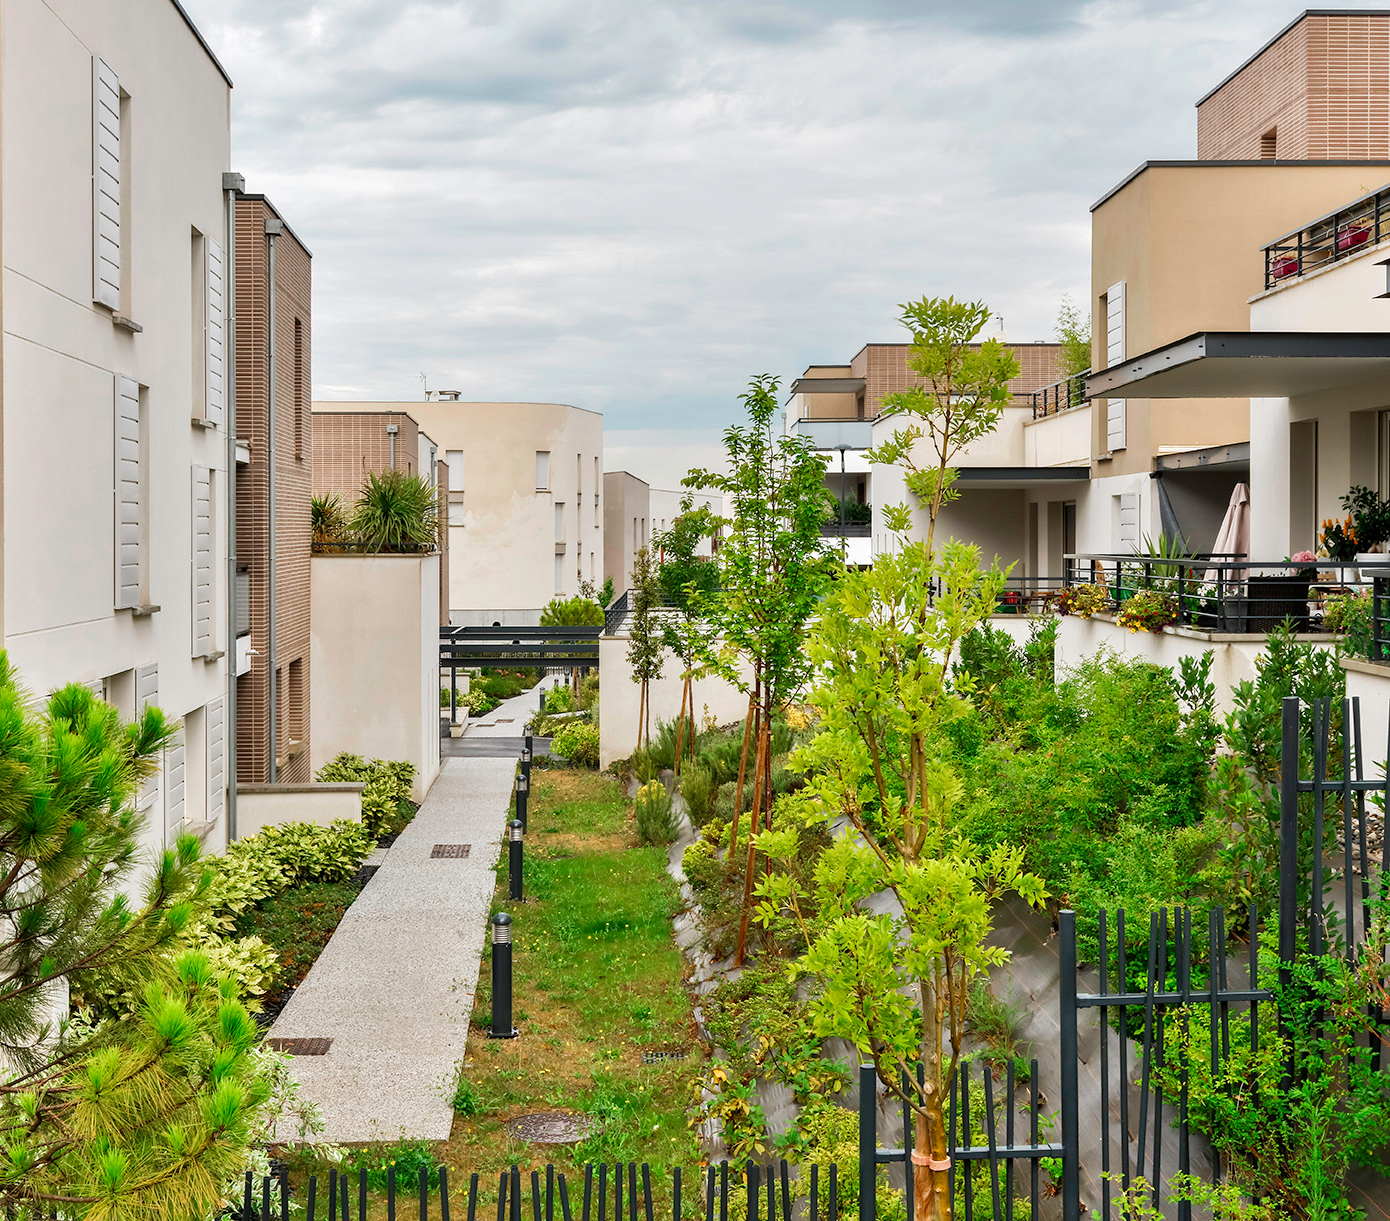 Les-Terrasses-de-Balma Balma MR3A